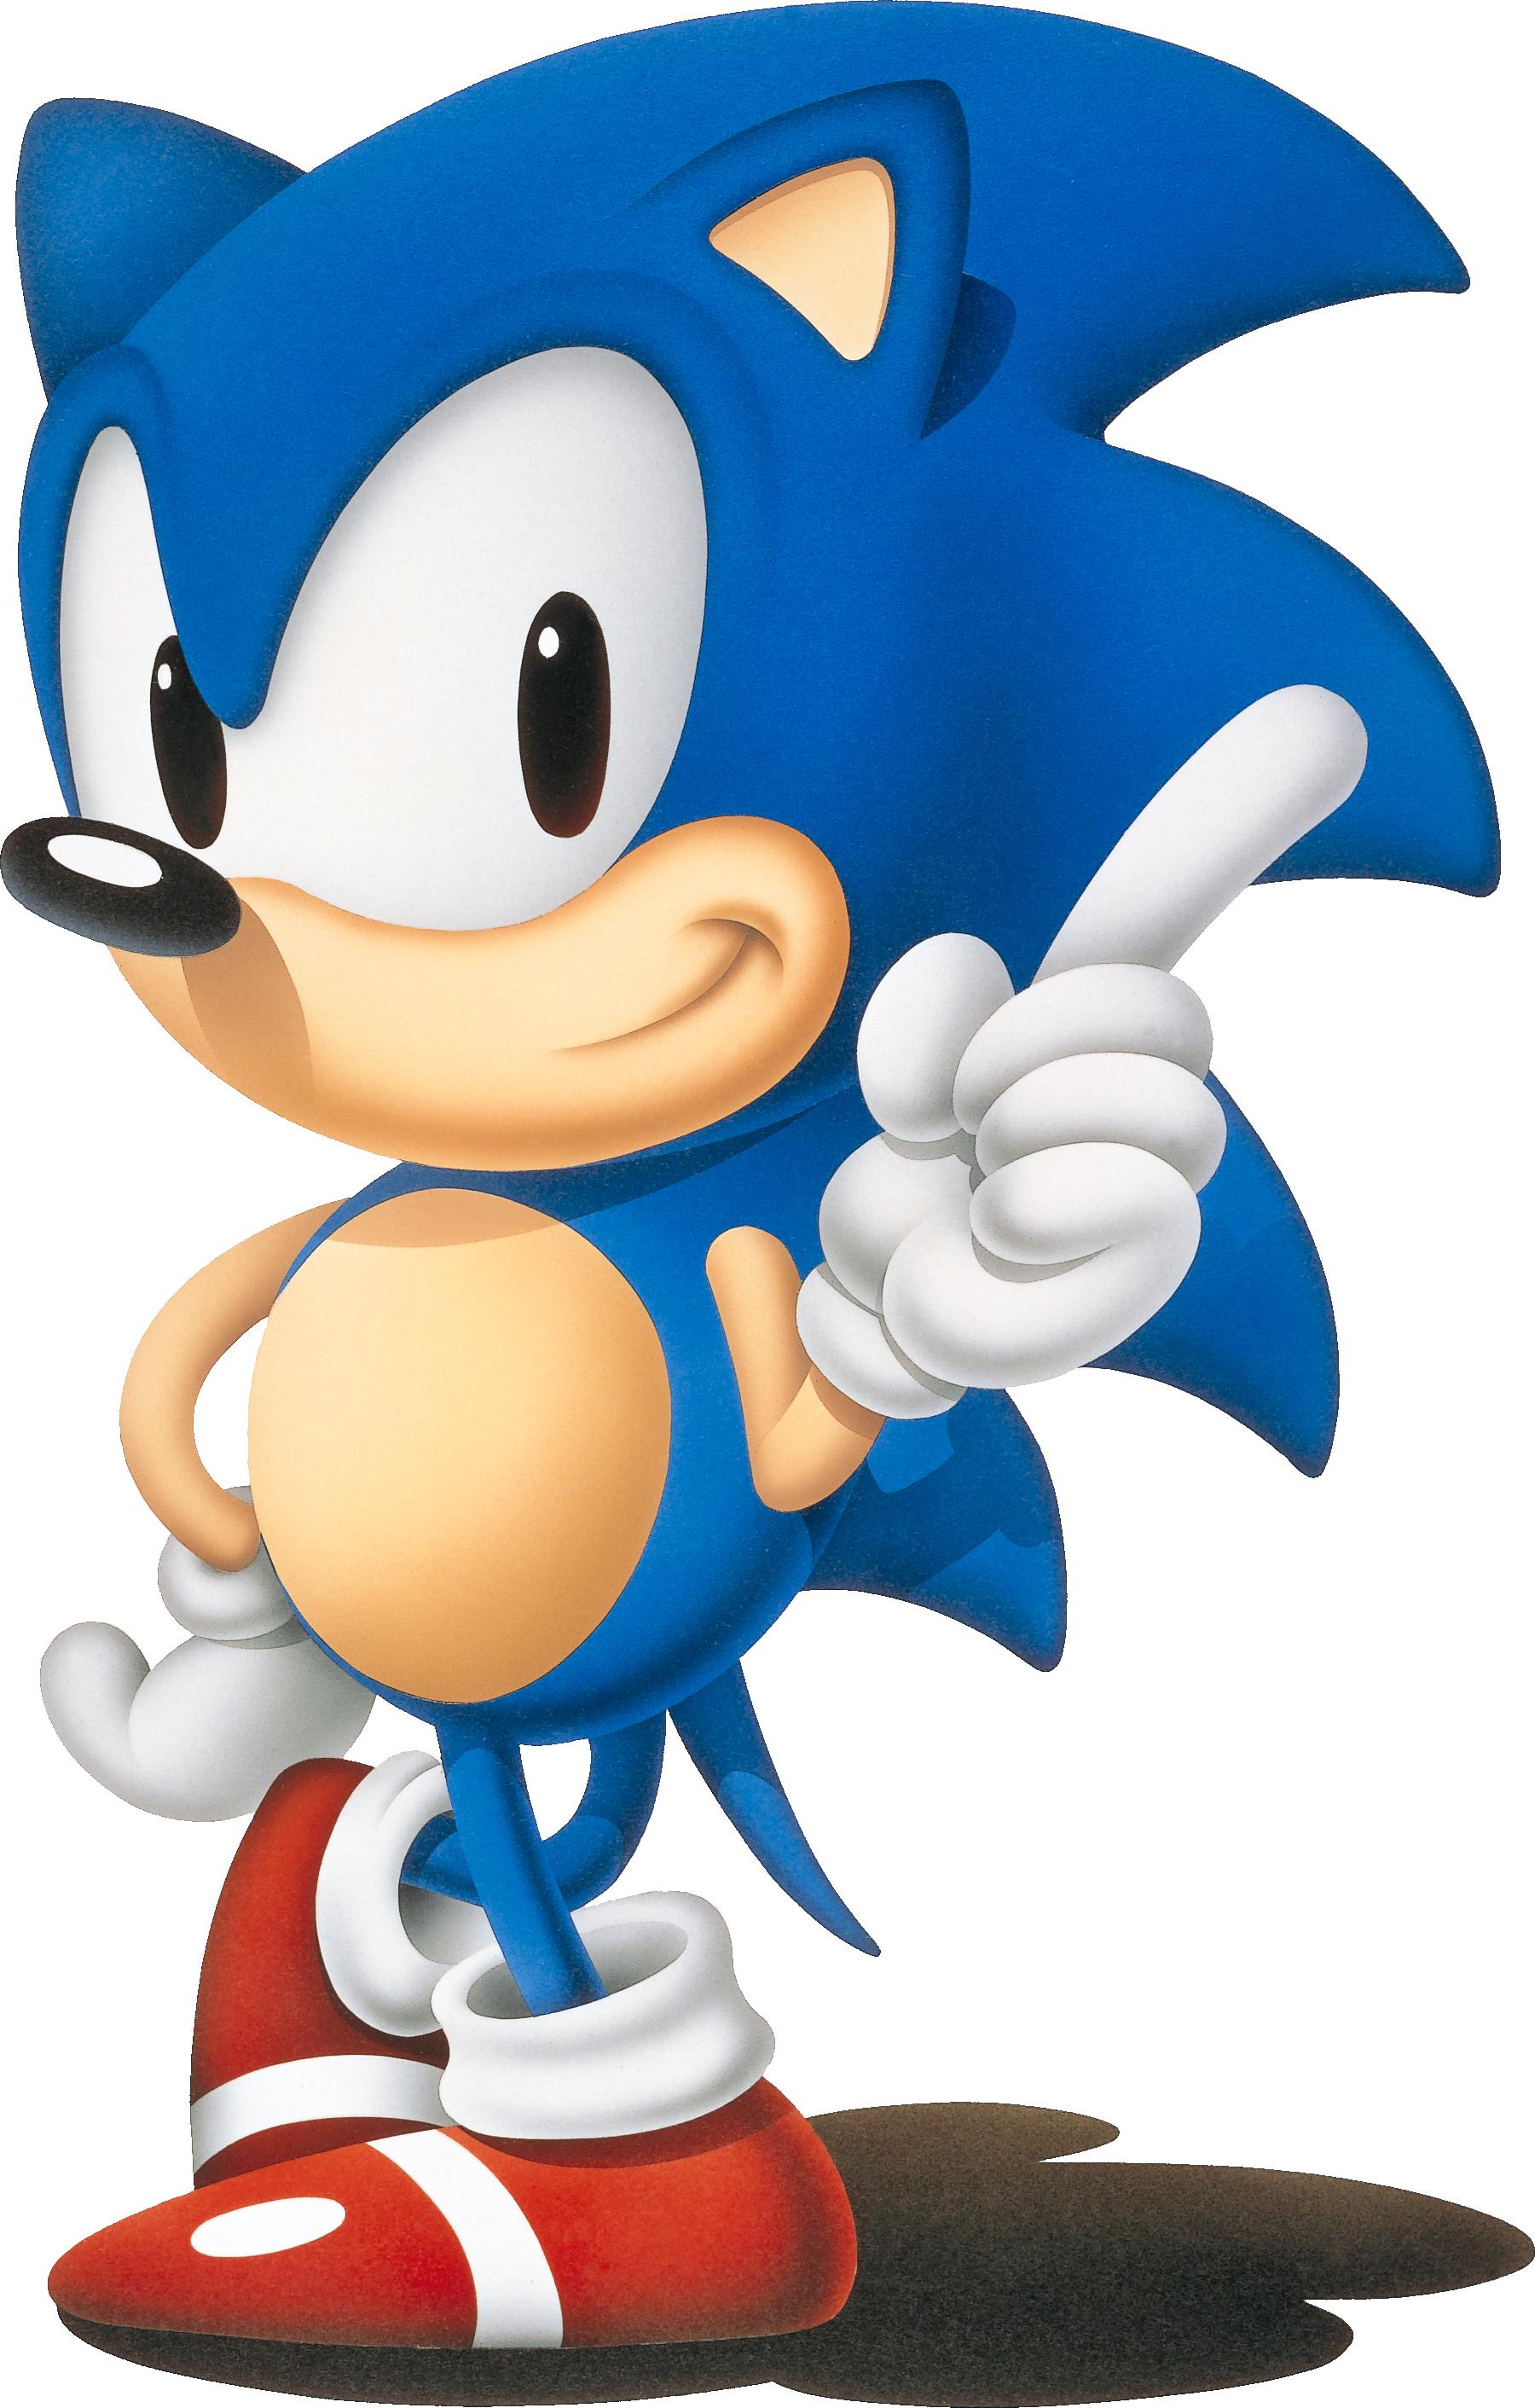 Super smash bros brawl sonic news network the sonic wiki - Super sonic 6 ...